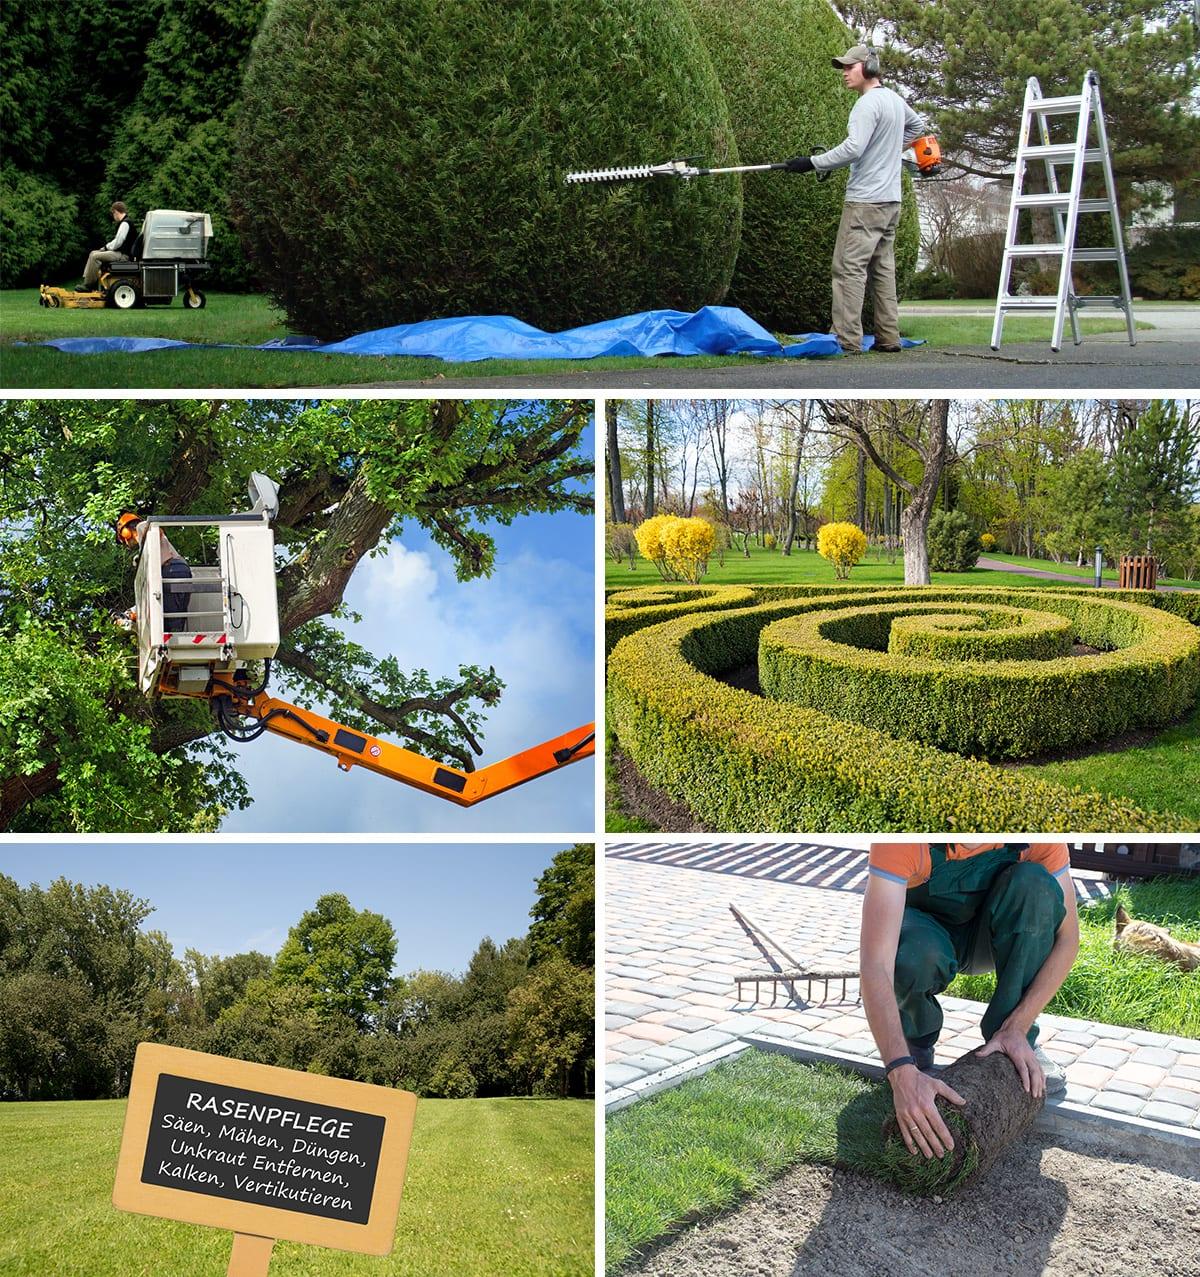 ASA Grünflächenpflege